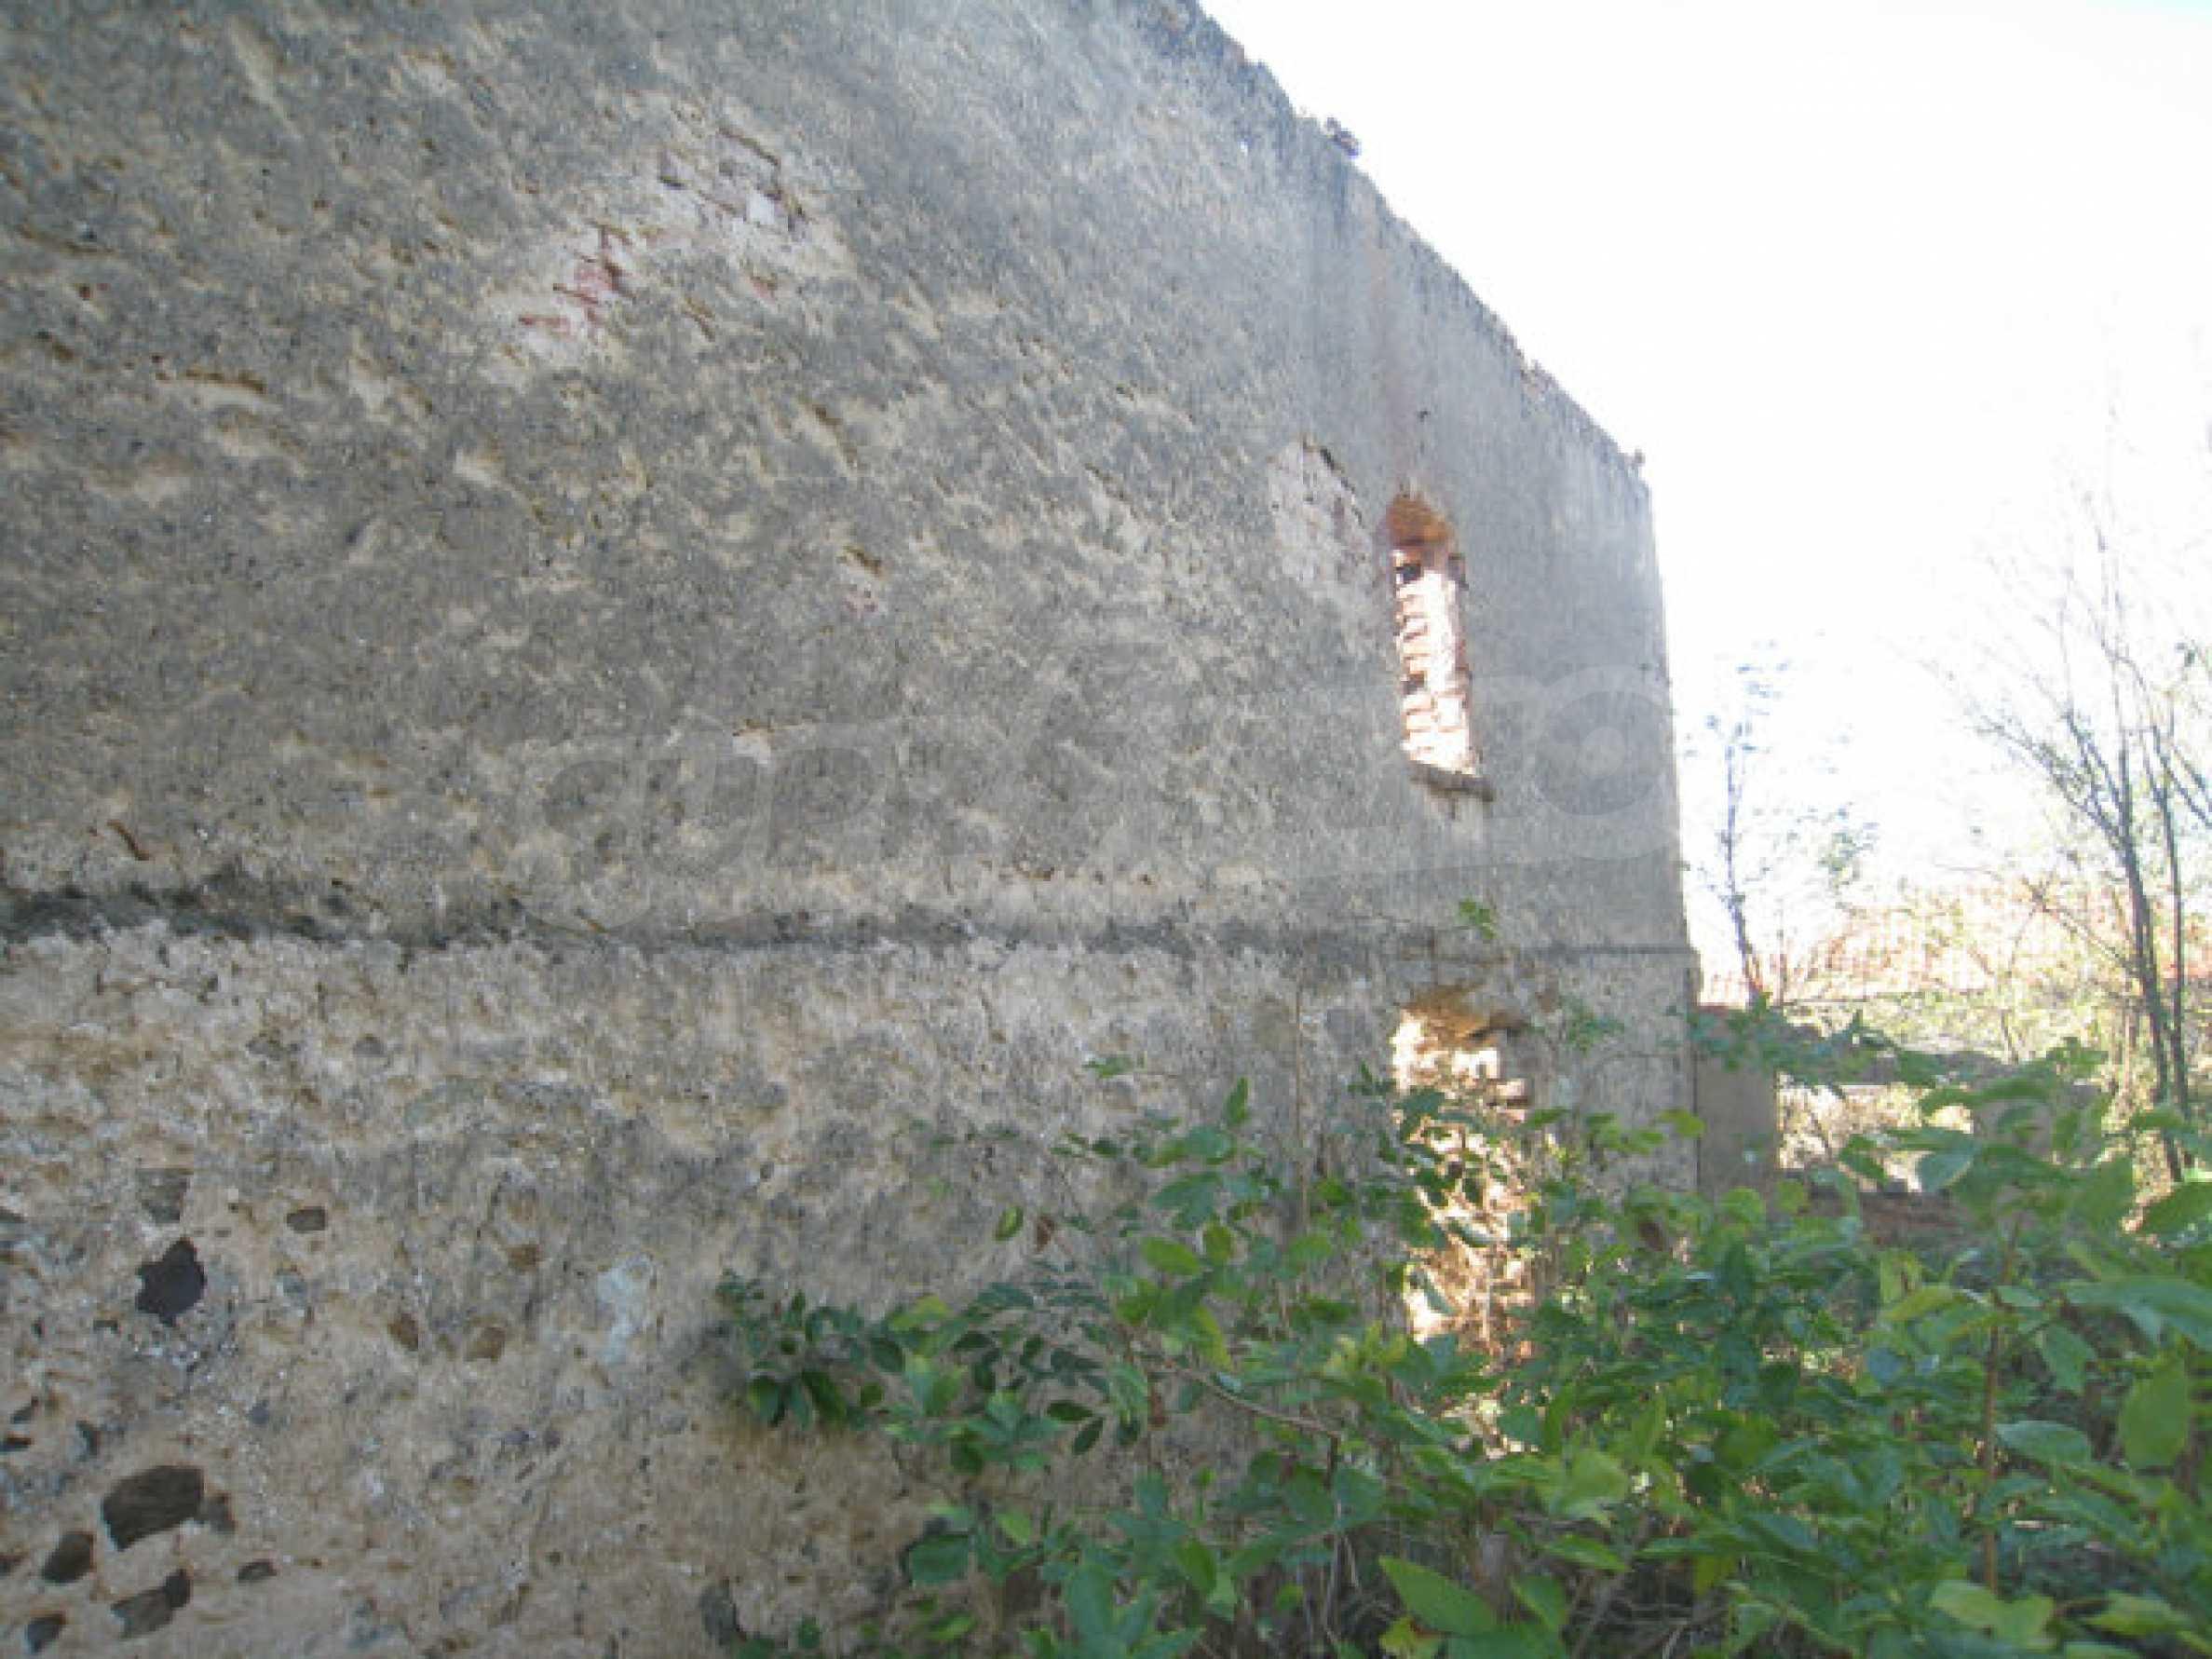 Bargain regulated plot in Ihtiman municipality near the highway and Sofia 9